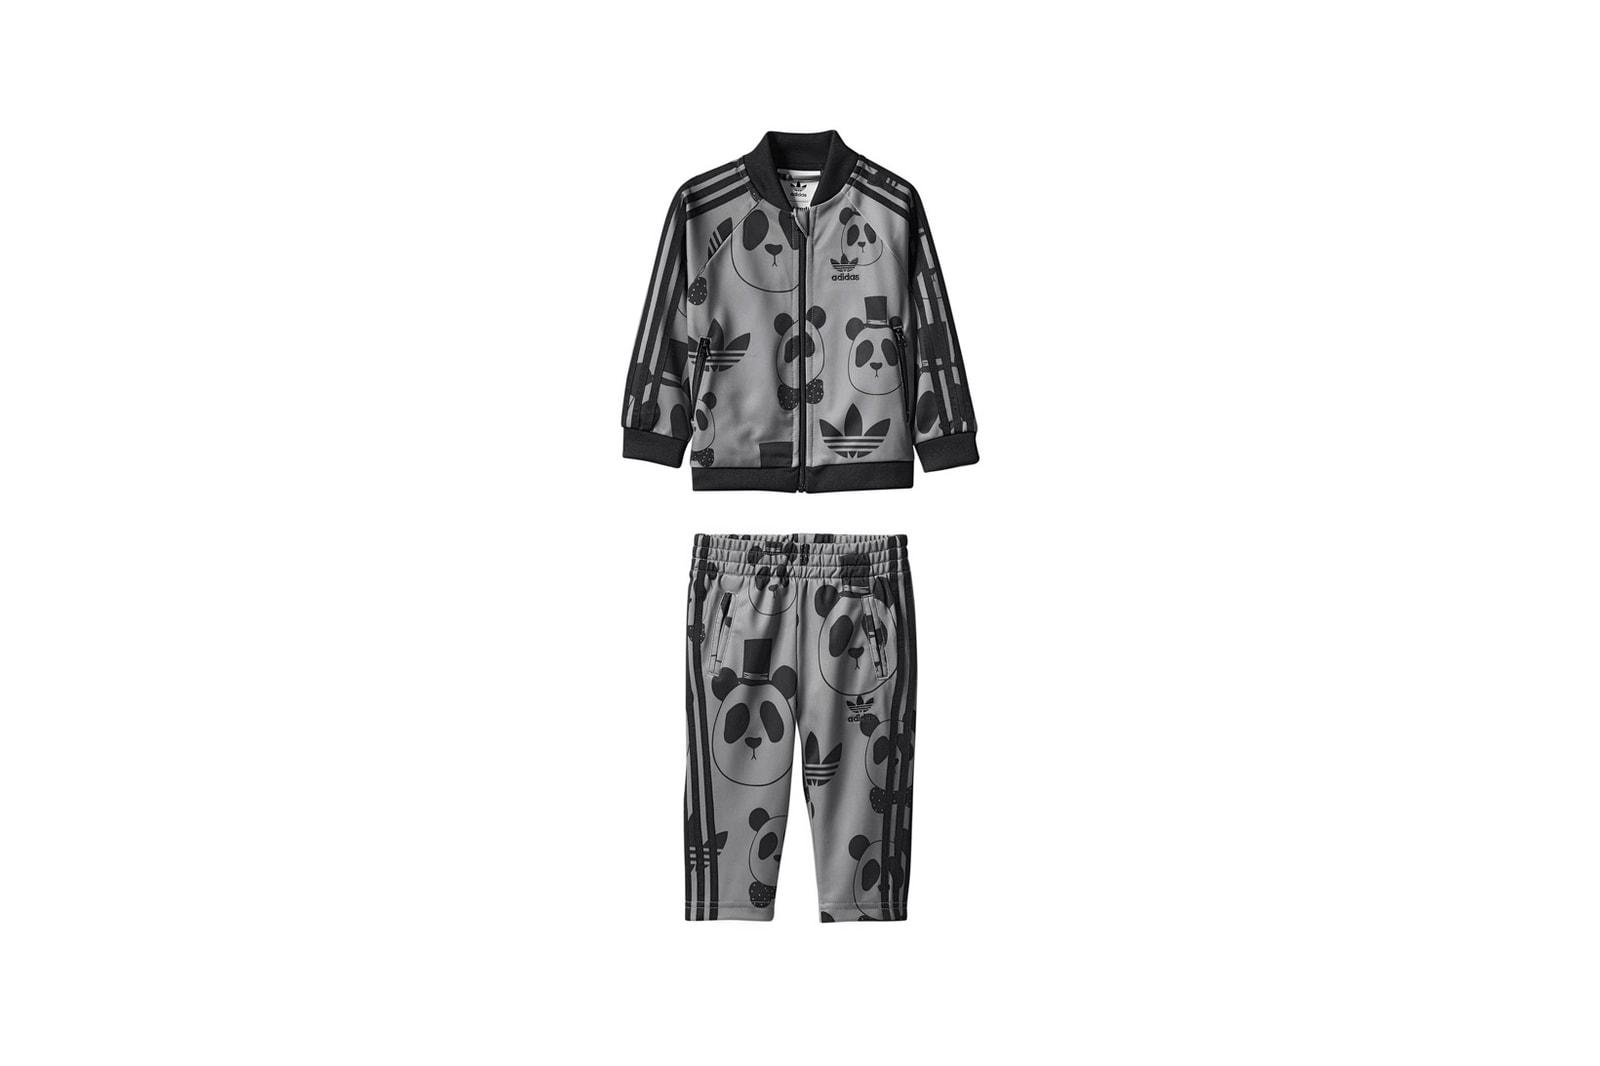 90b8a8c42f811 Mini Rodini adidas Originals 2017 Spring Summer Collection Third Drop